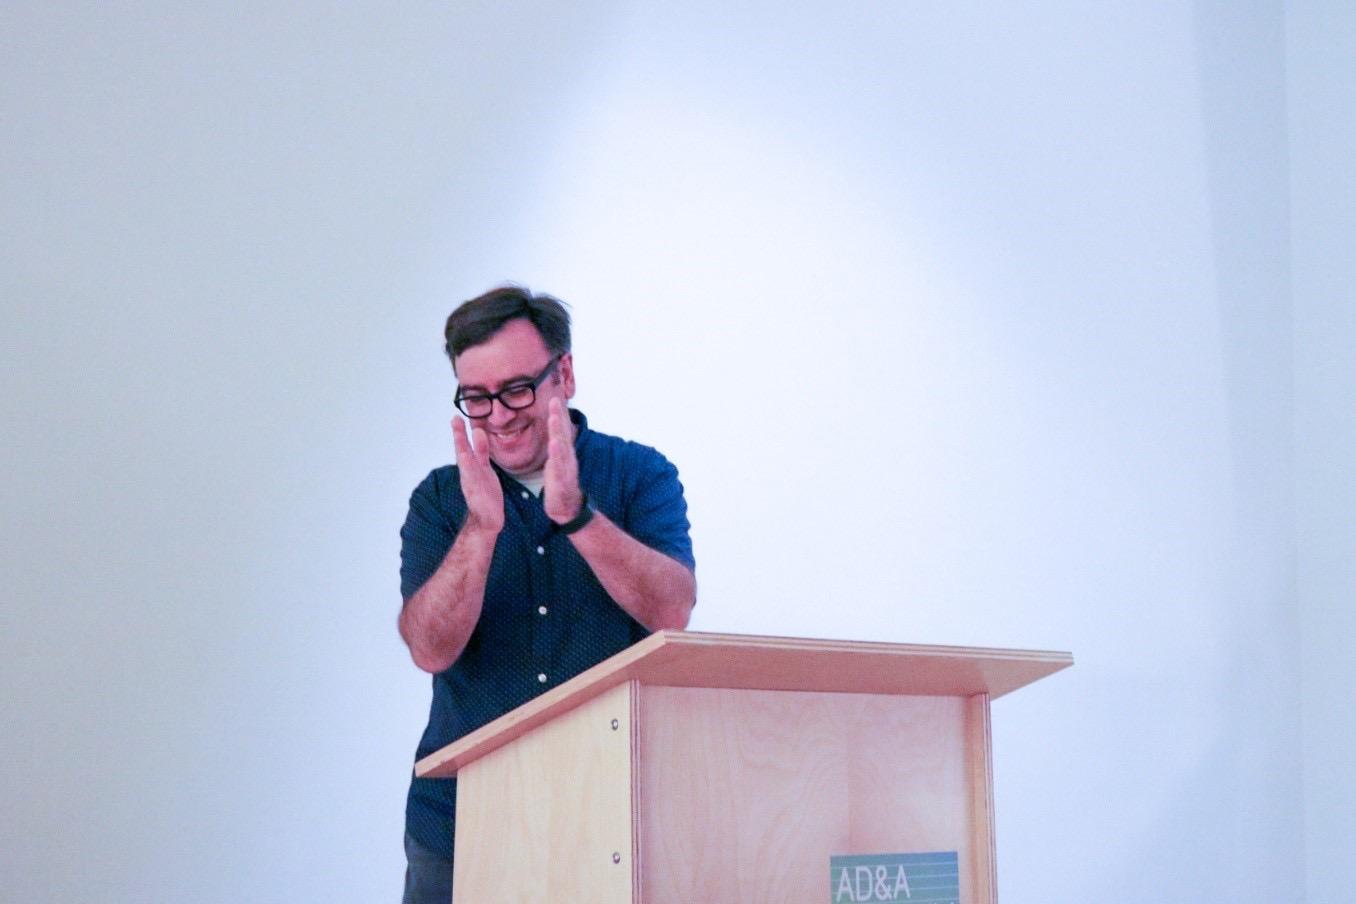 Writing Program Lecturer Robert Krut